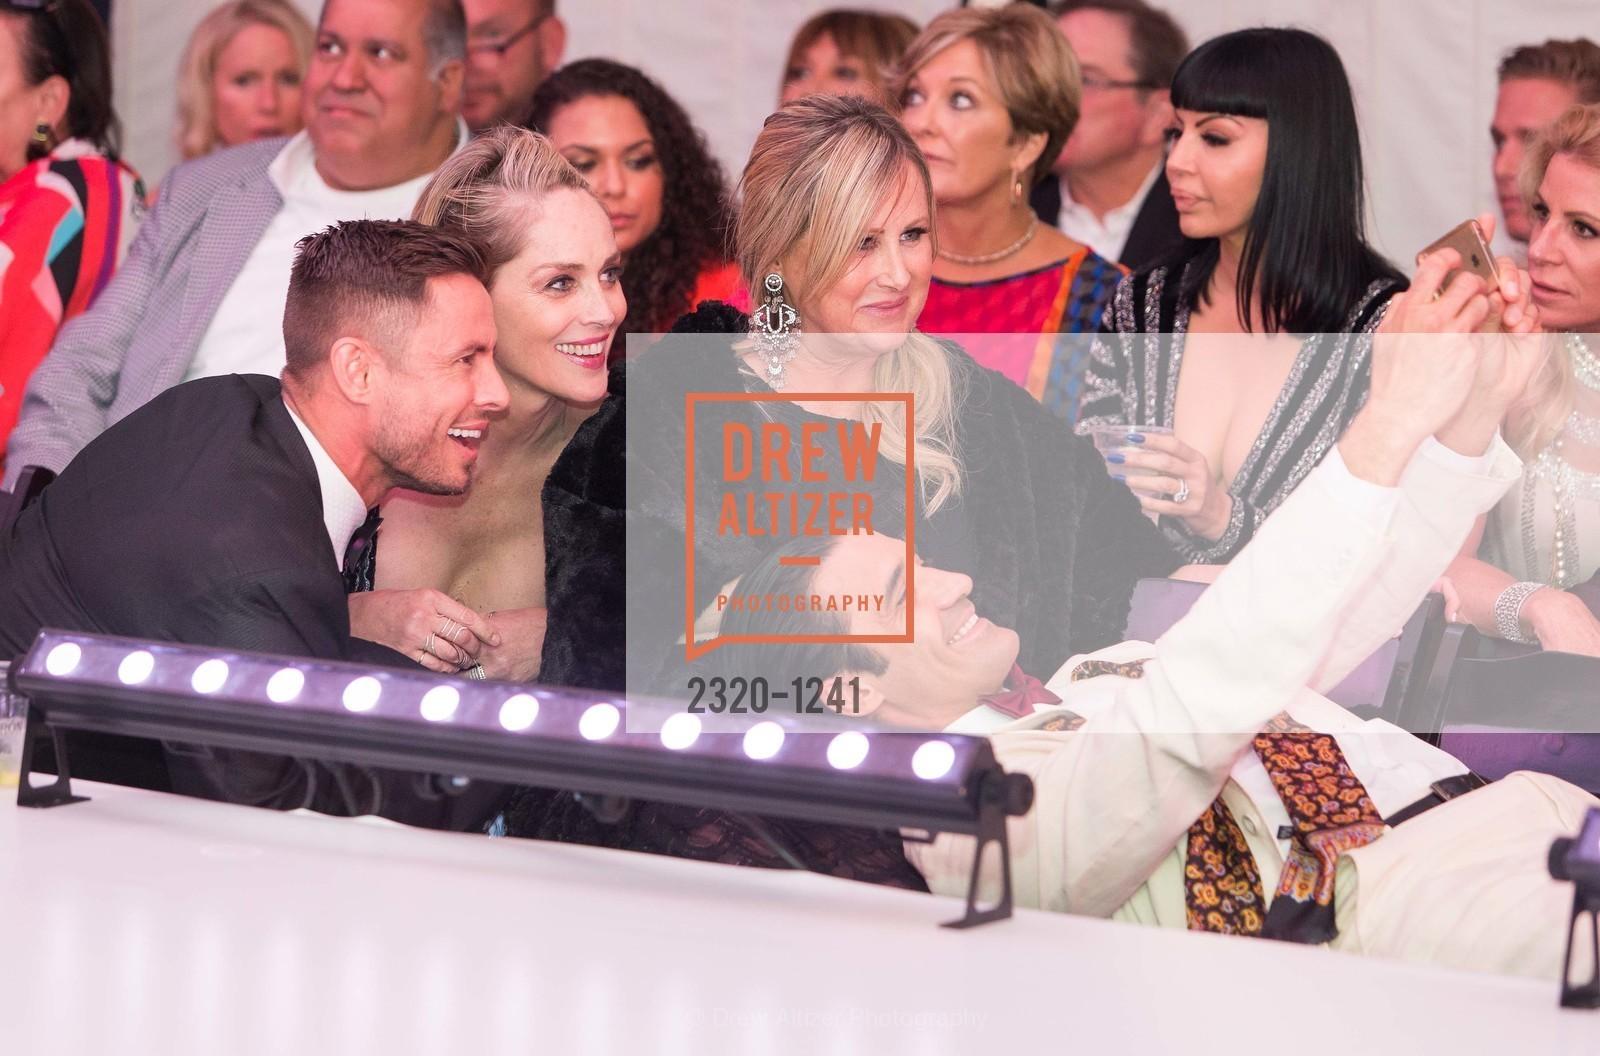 Galen Drever, Sharon Stone, Kelly Stone, Gilles Marini, Photo #2320-1241